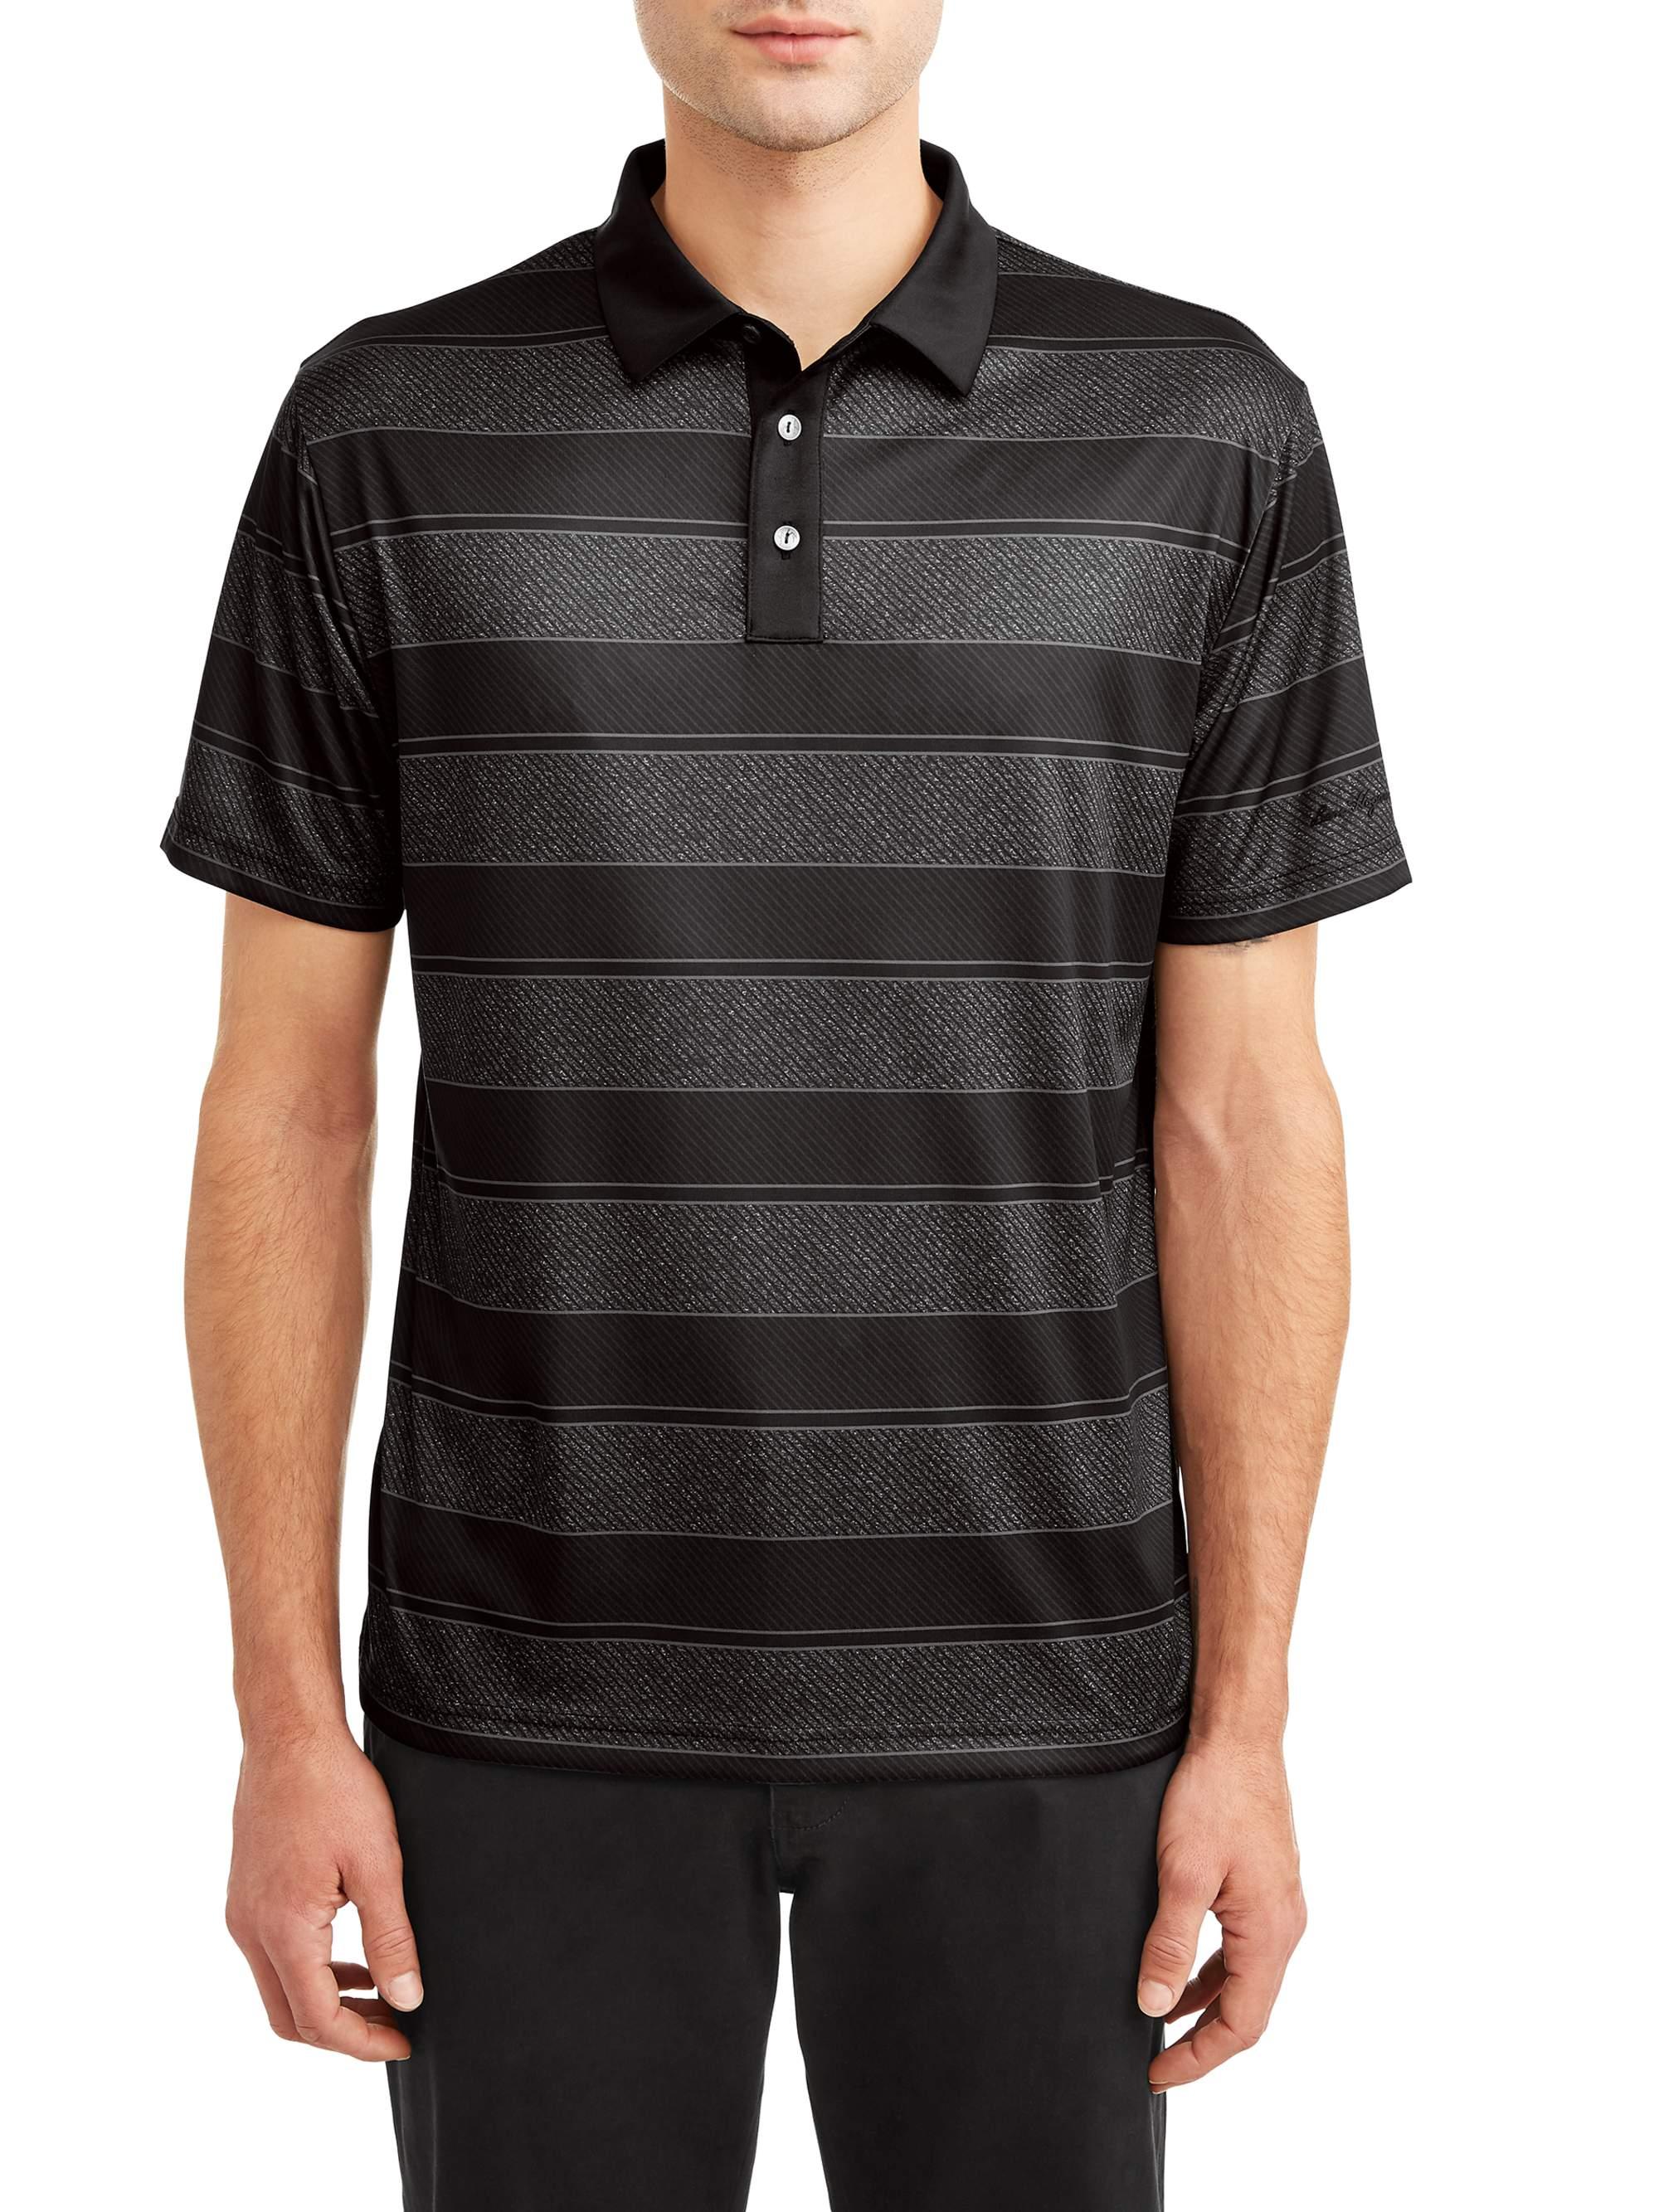 Men's Performance Short Sleeve Fading Stripe Golf Polo Shirt